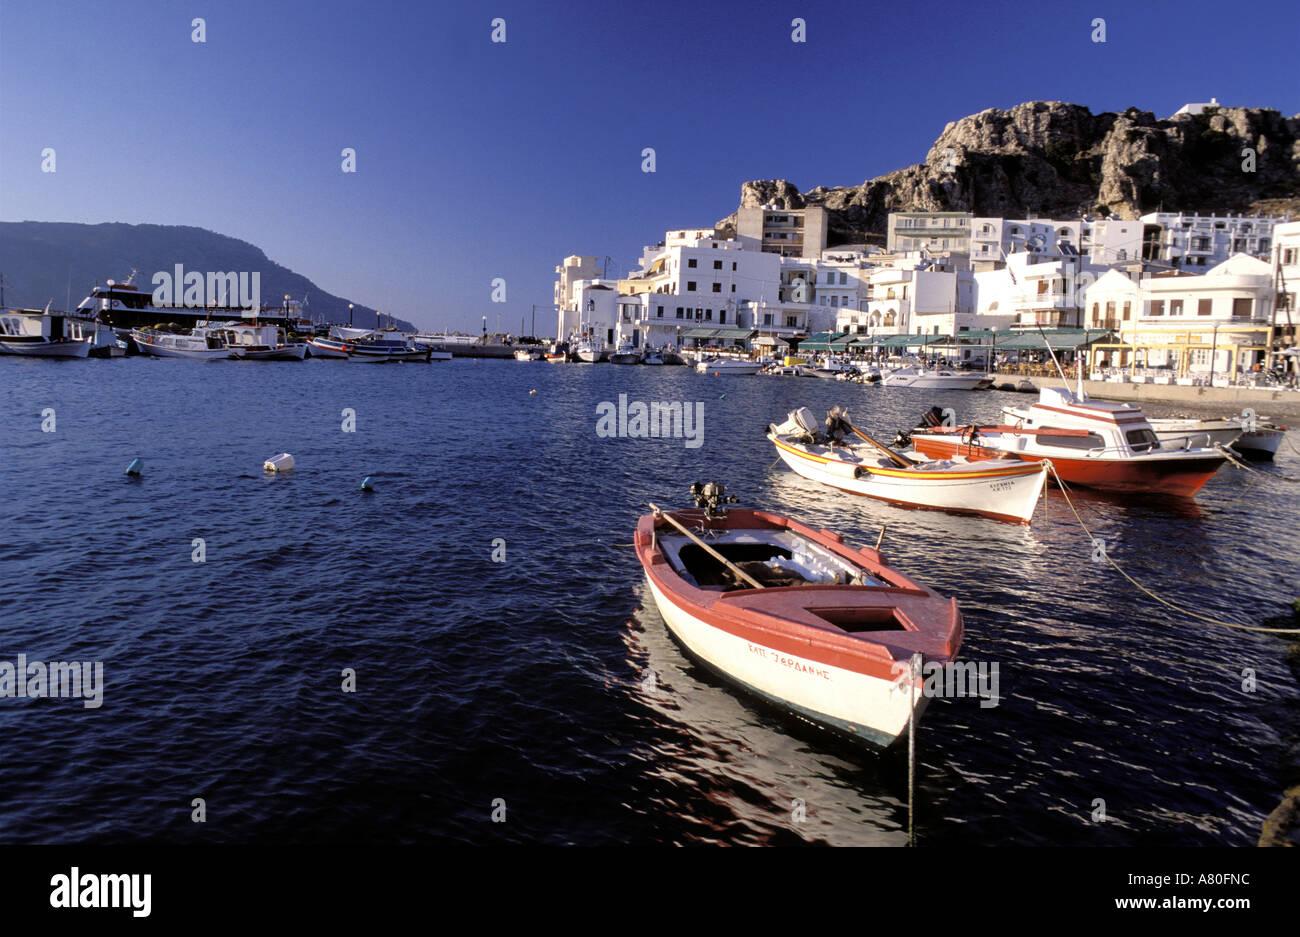 Greece, Dodecanese islands, island of Karpathos, city of Pigadia Stock Photo